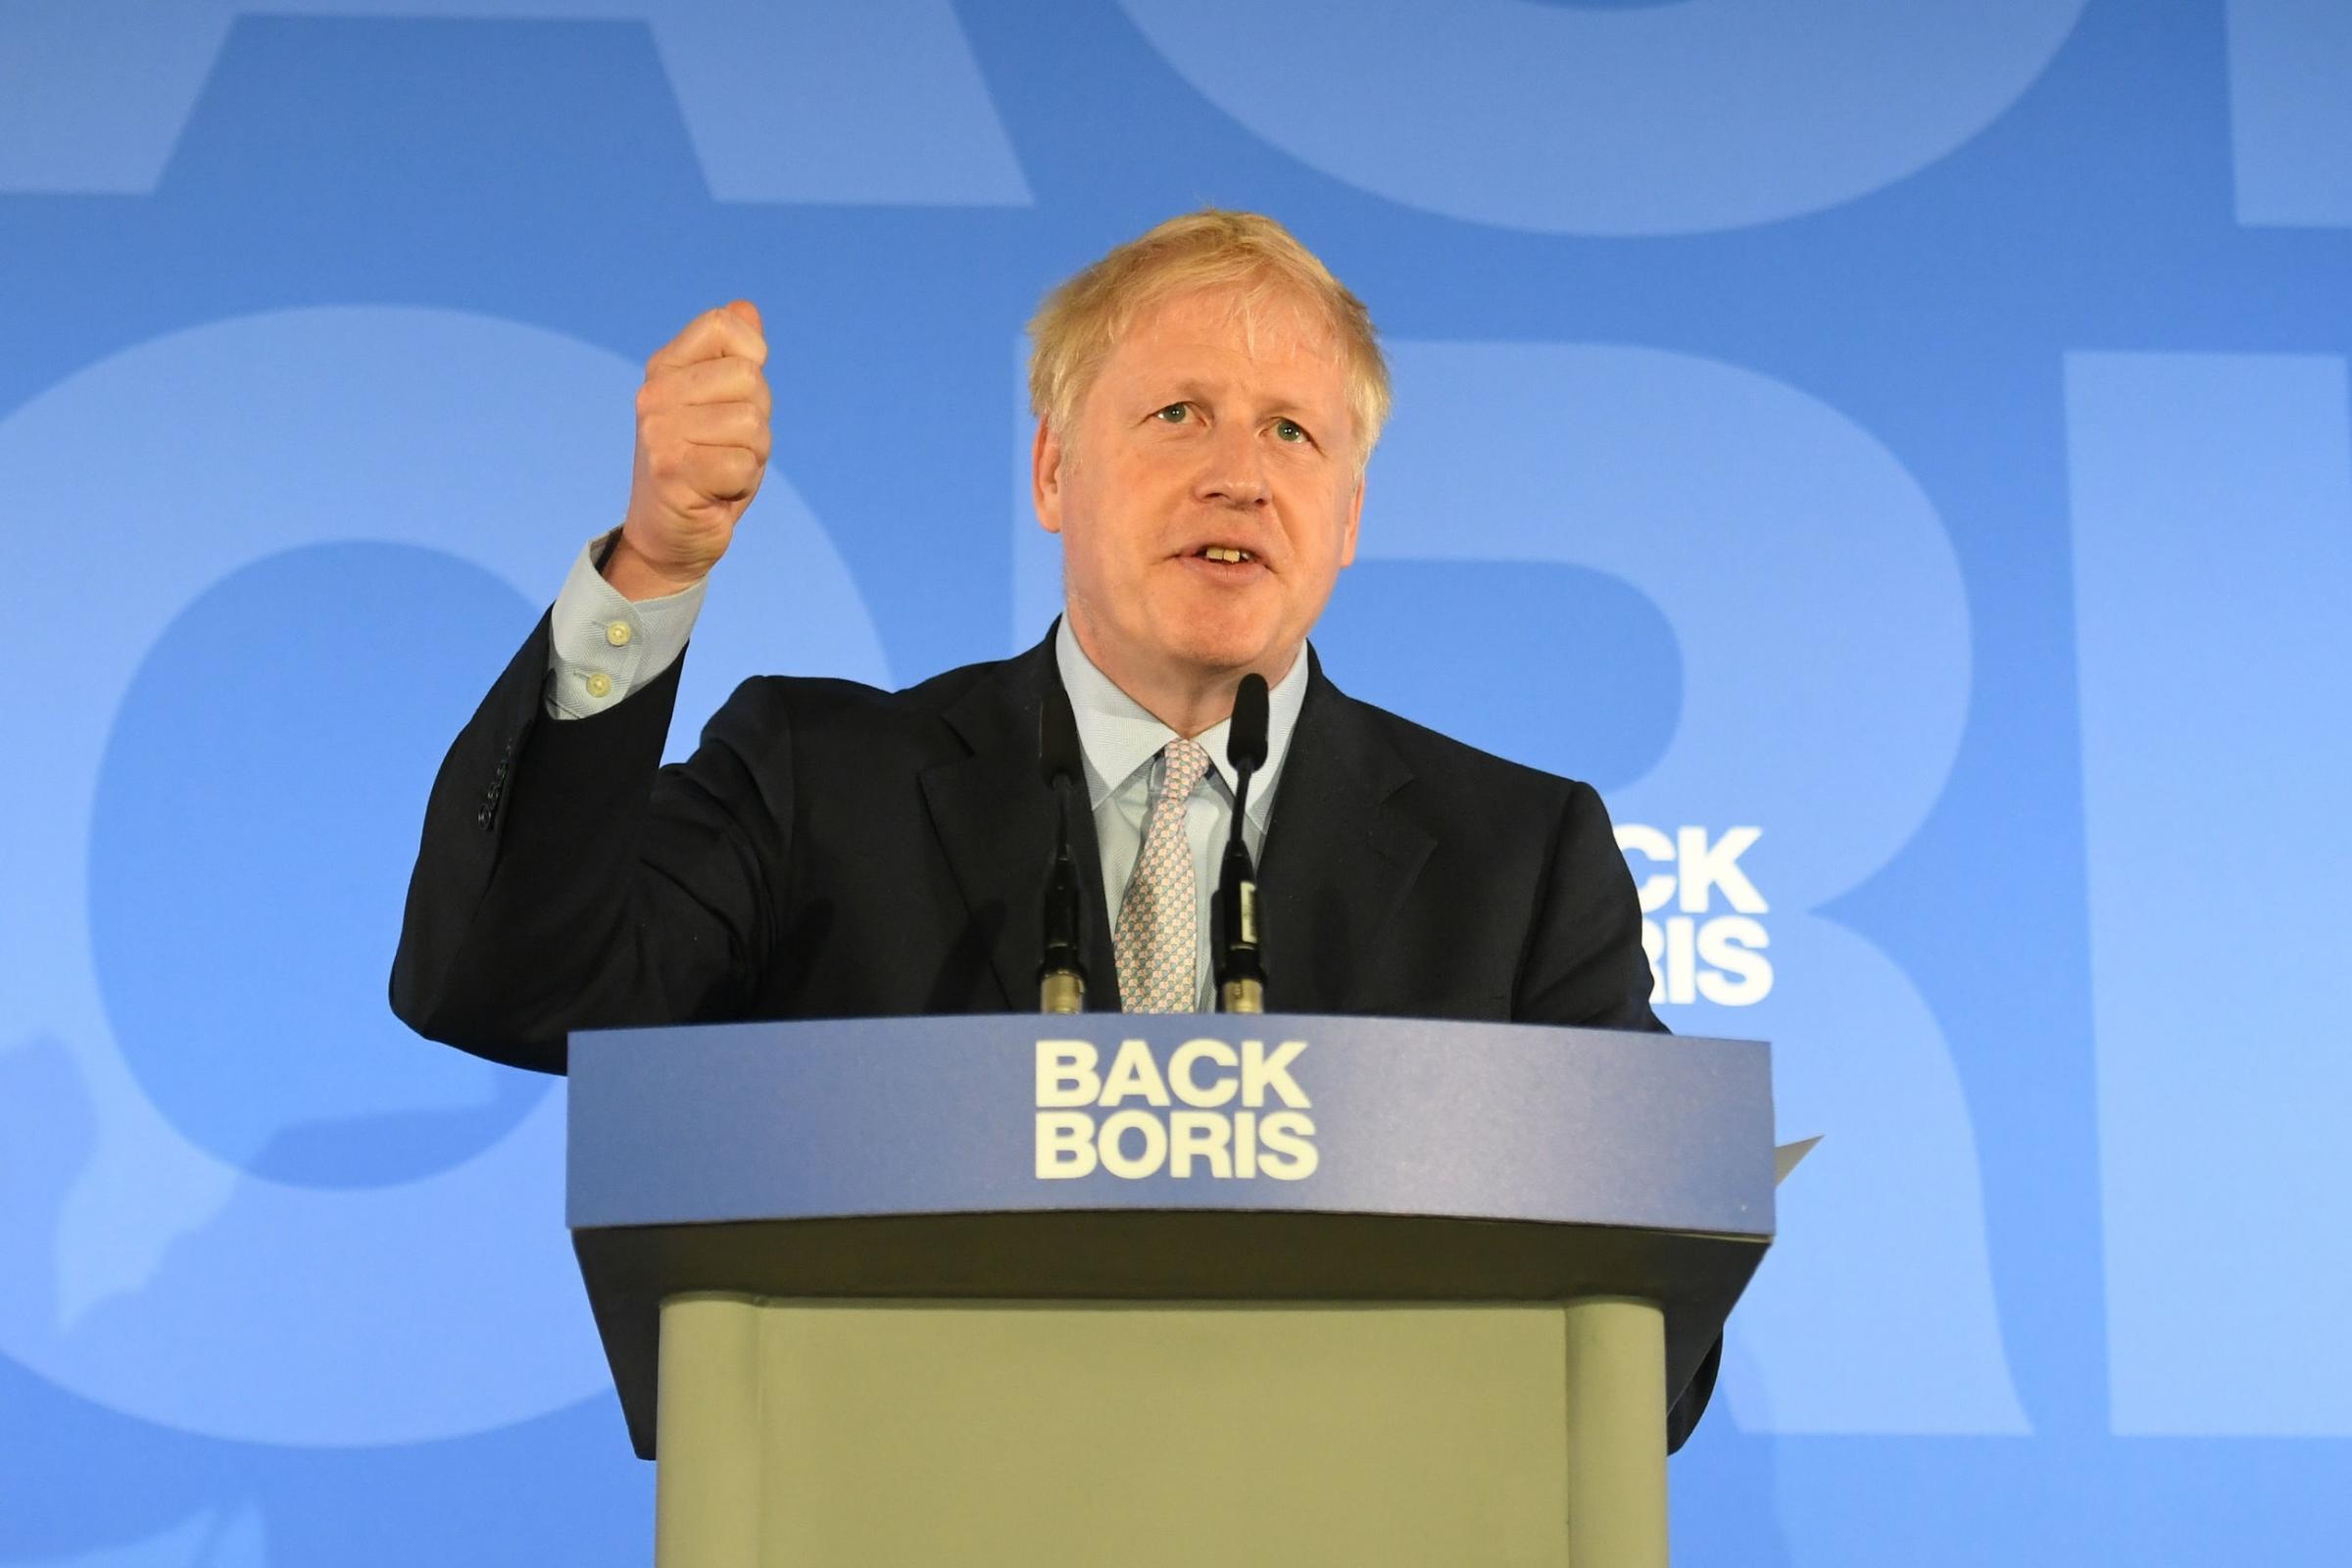 Fact-check: Did Boris Johnson call Scottish people a 'verminous race'?